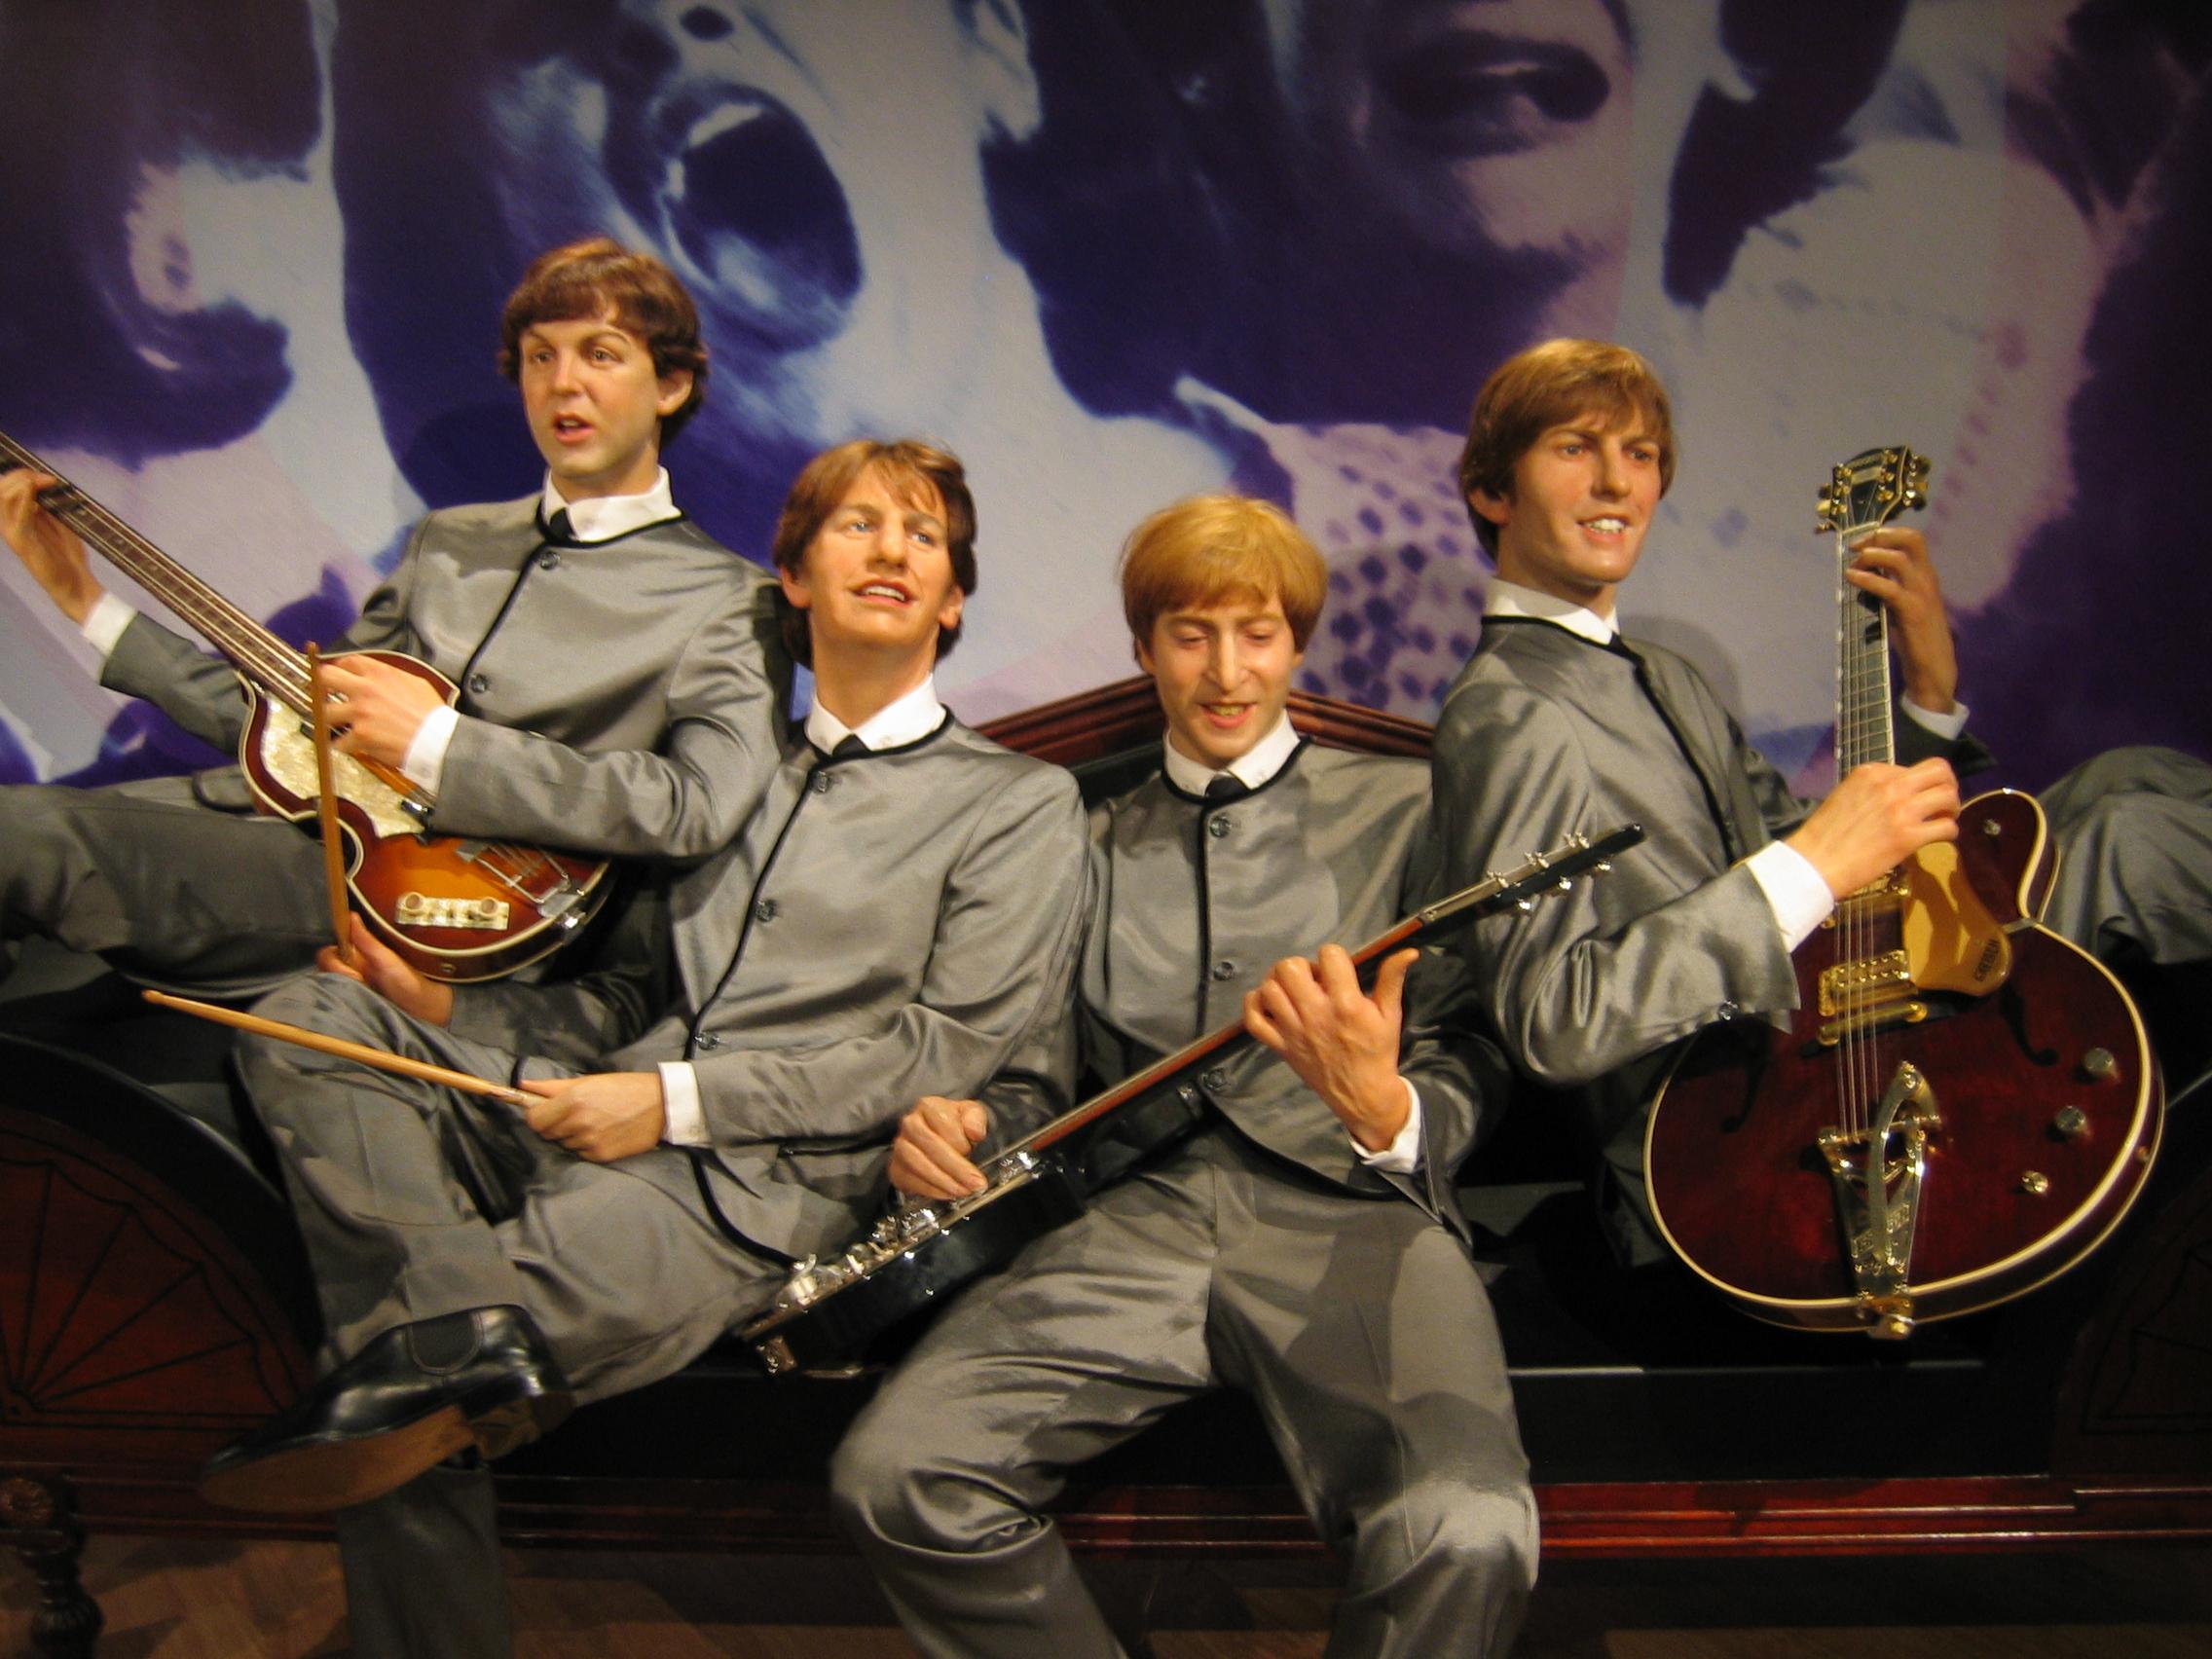 FileThe Beatles Wax Dummes 2